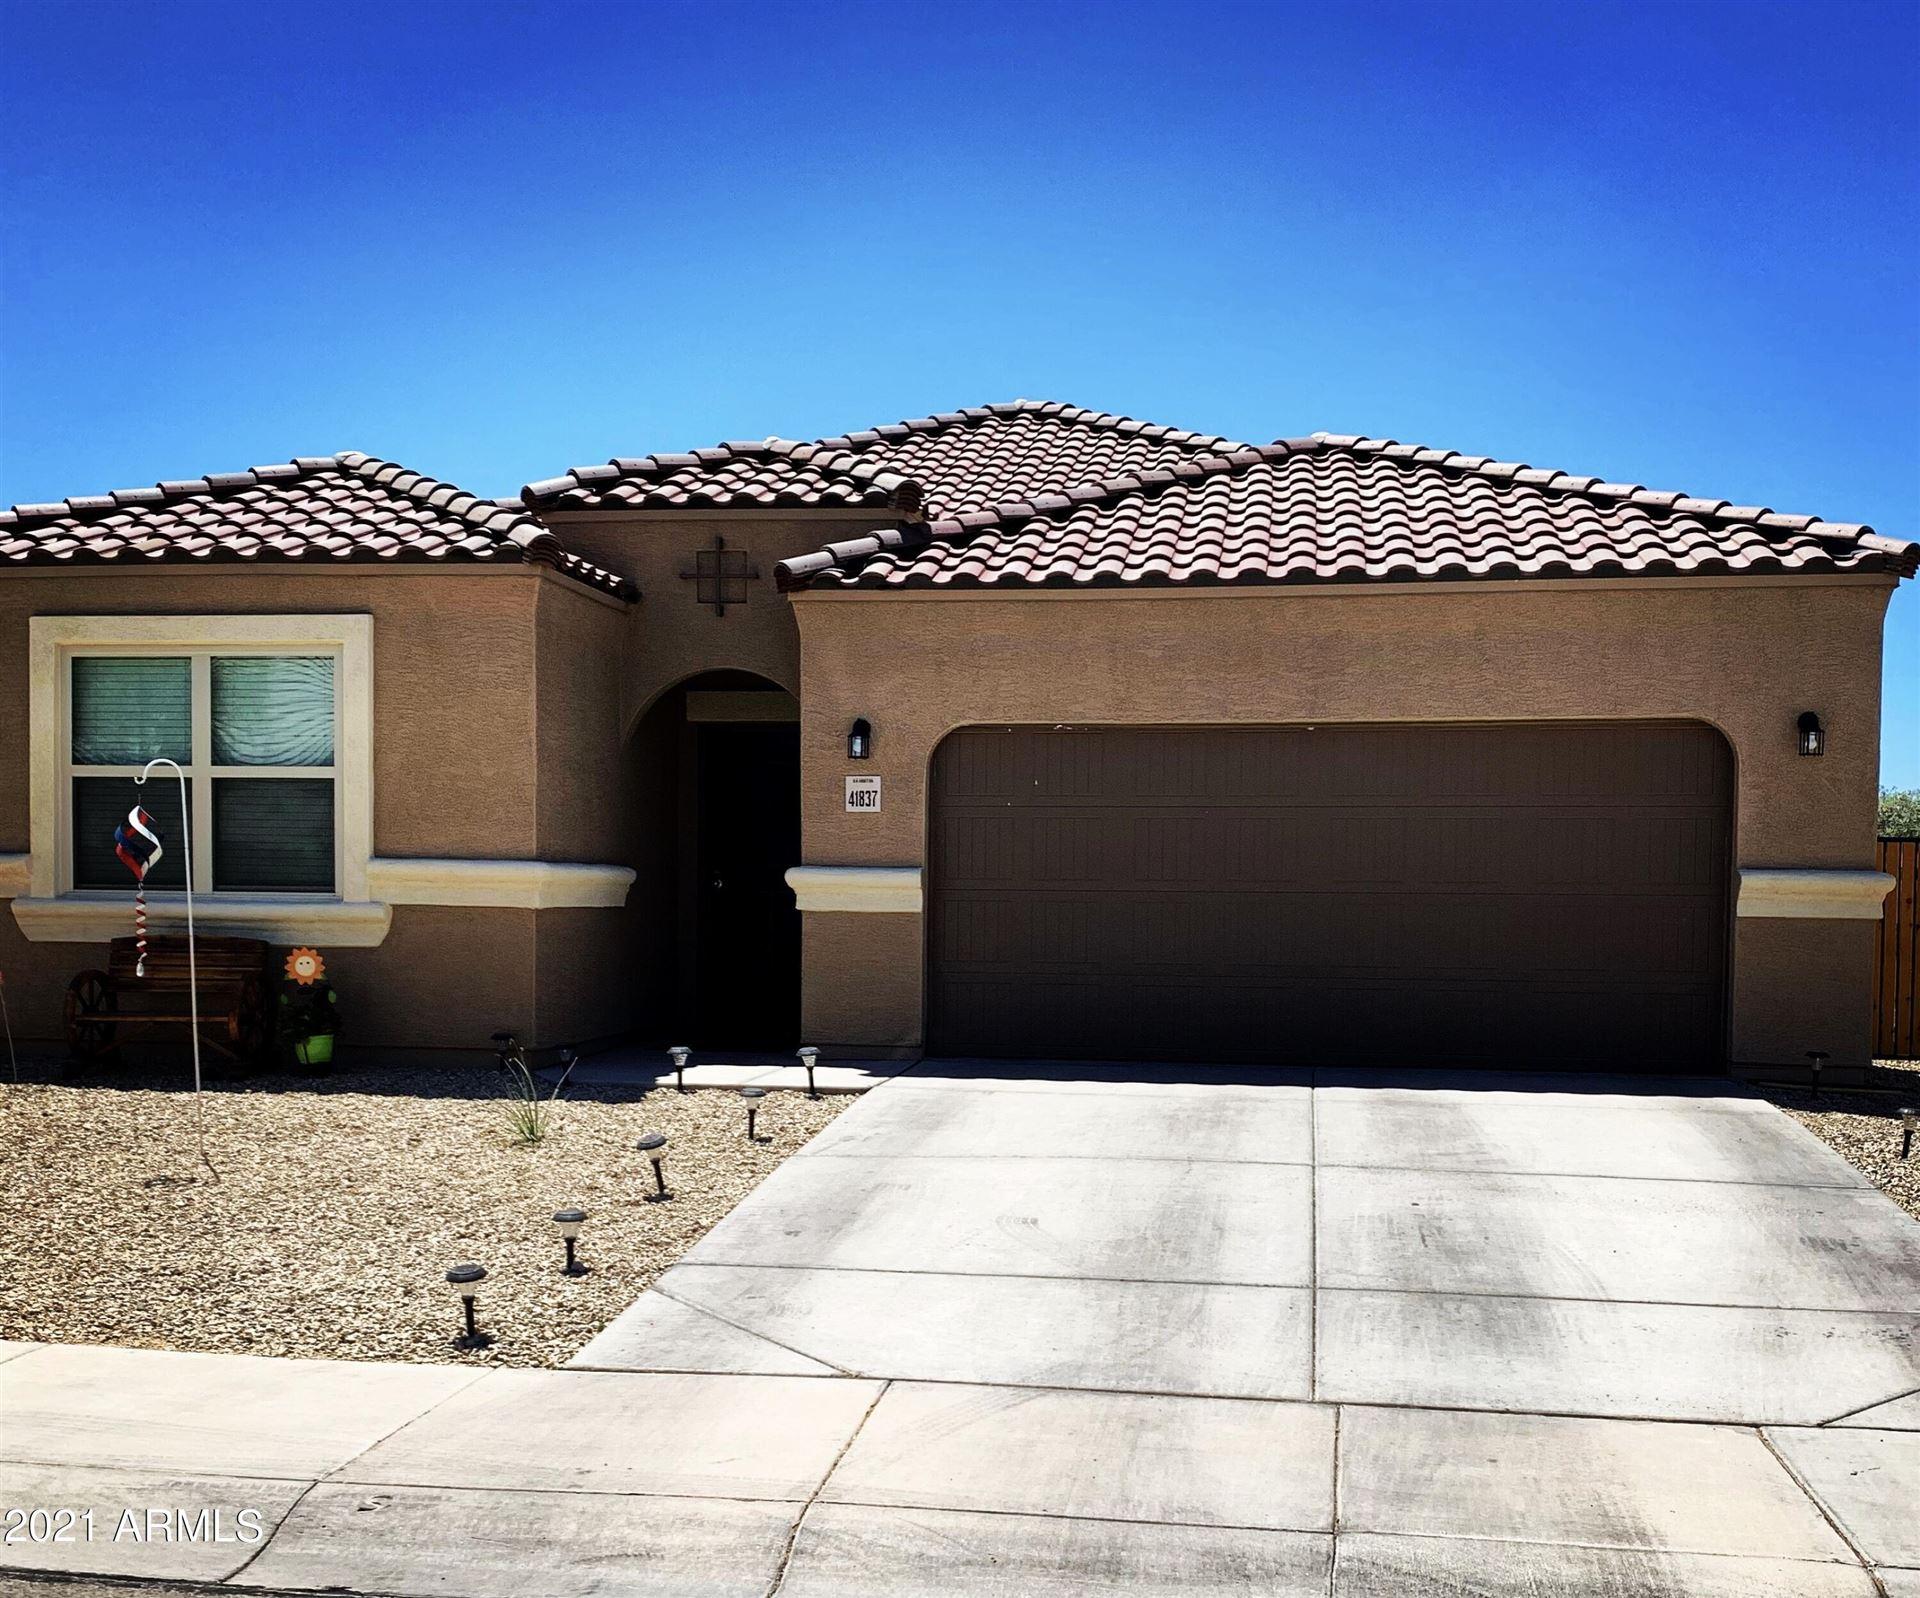 Photo for 41837 W PLATA Street, Maricopa, AZ 85138 (MLS # 6284397)